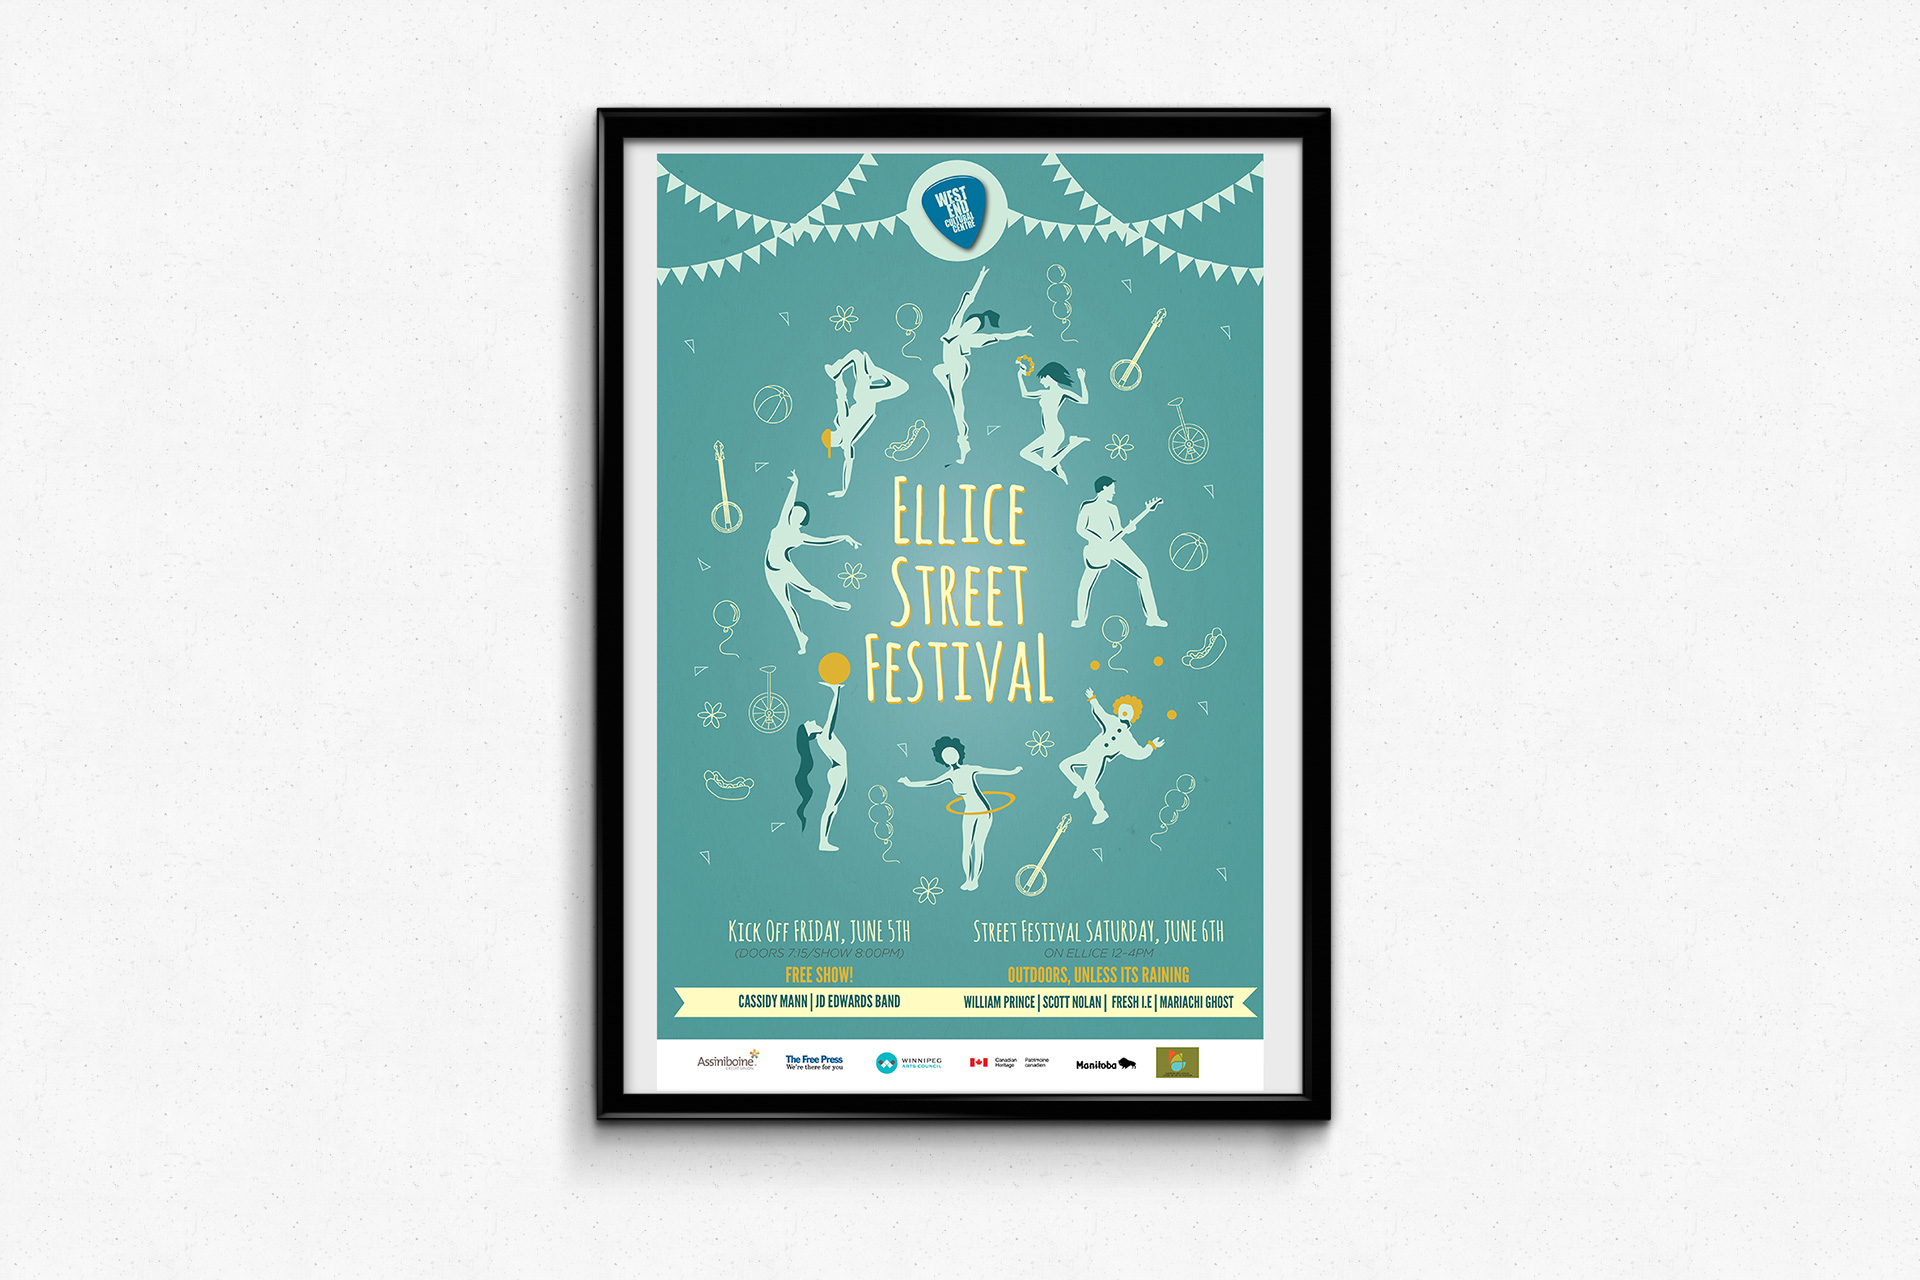 WECC– Ellice Street Festival